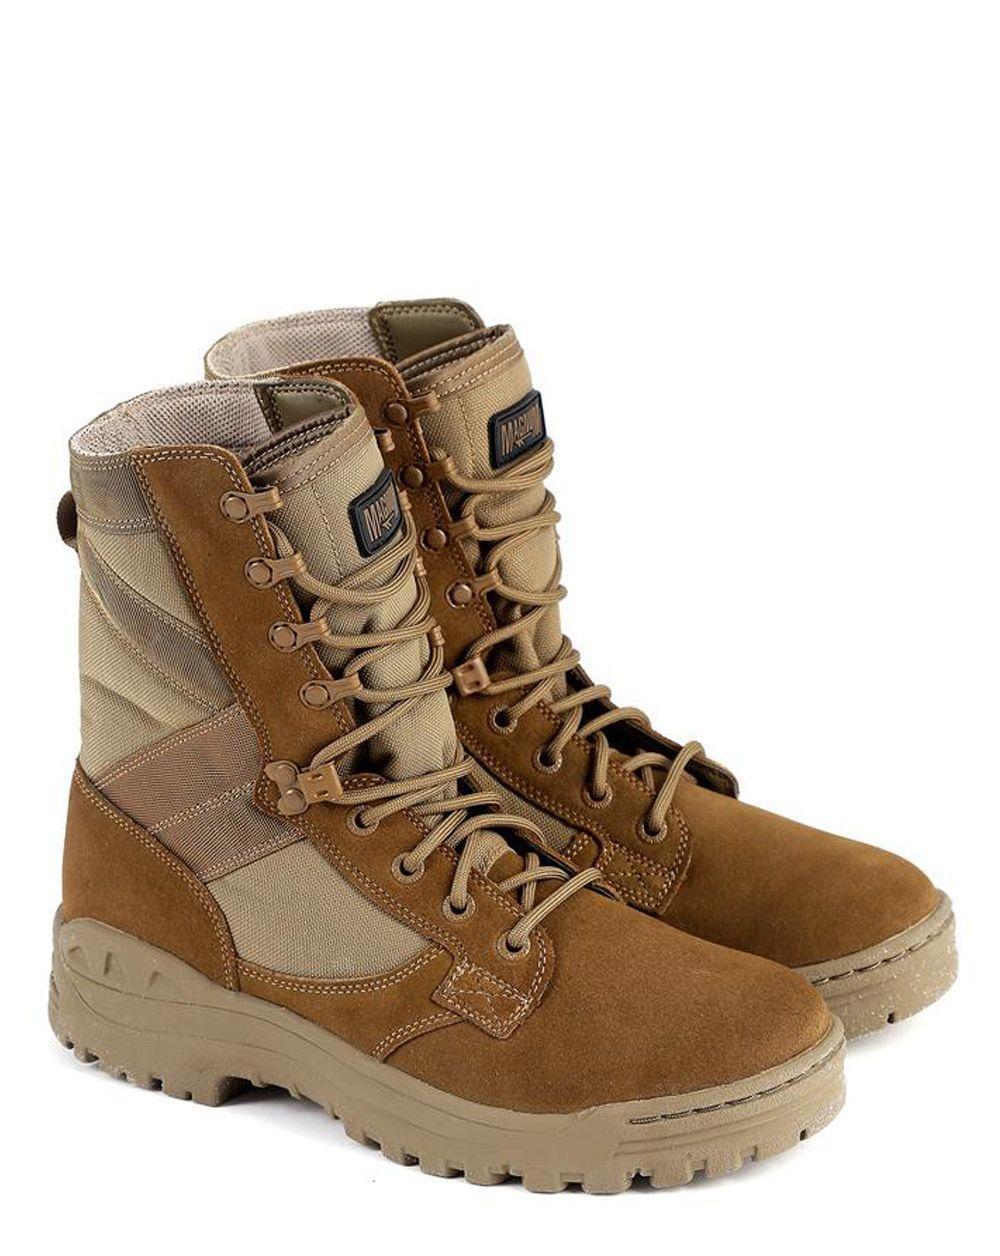 Buy Magnum Amazon Jungle Boots | Money